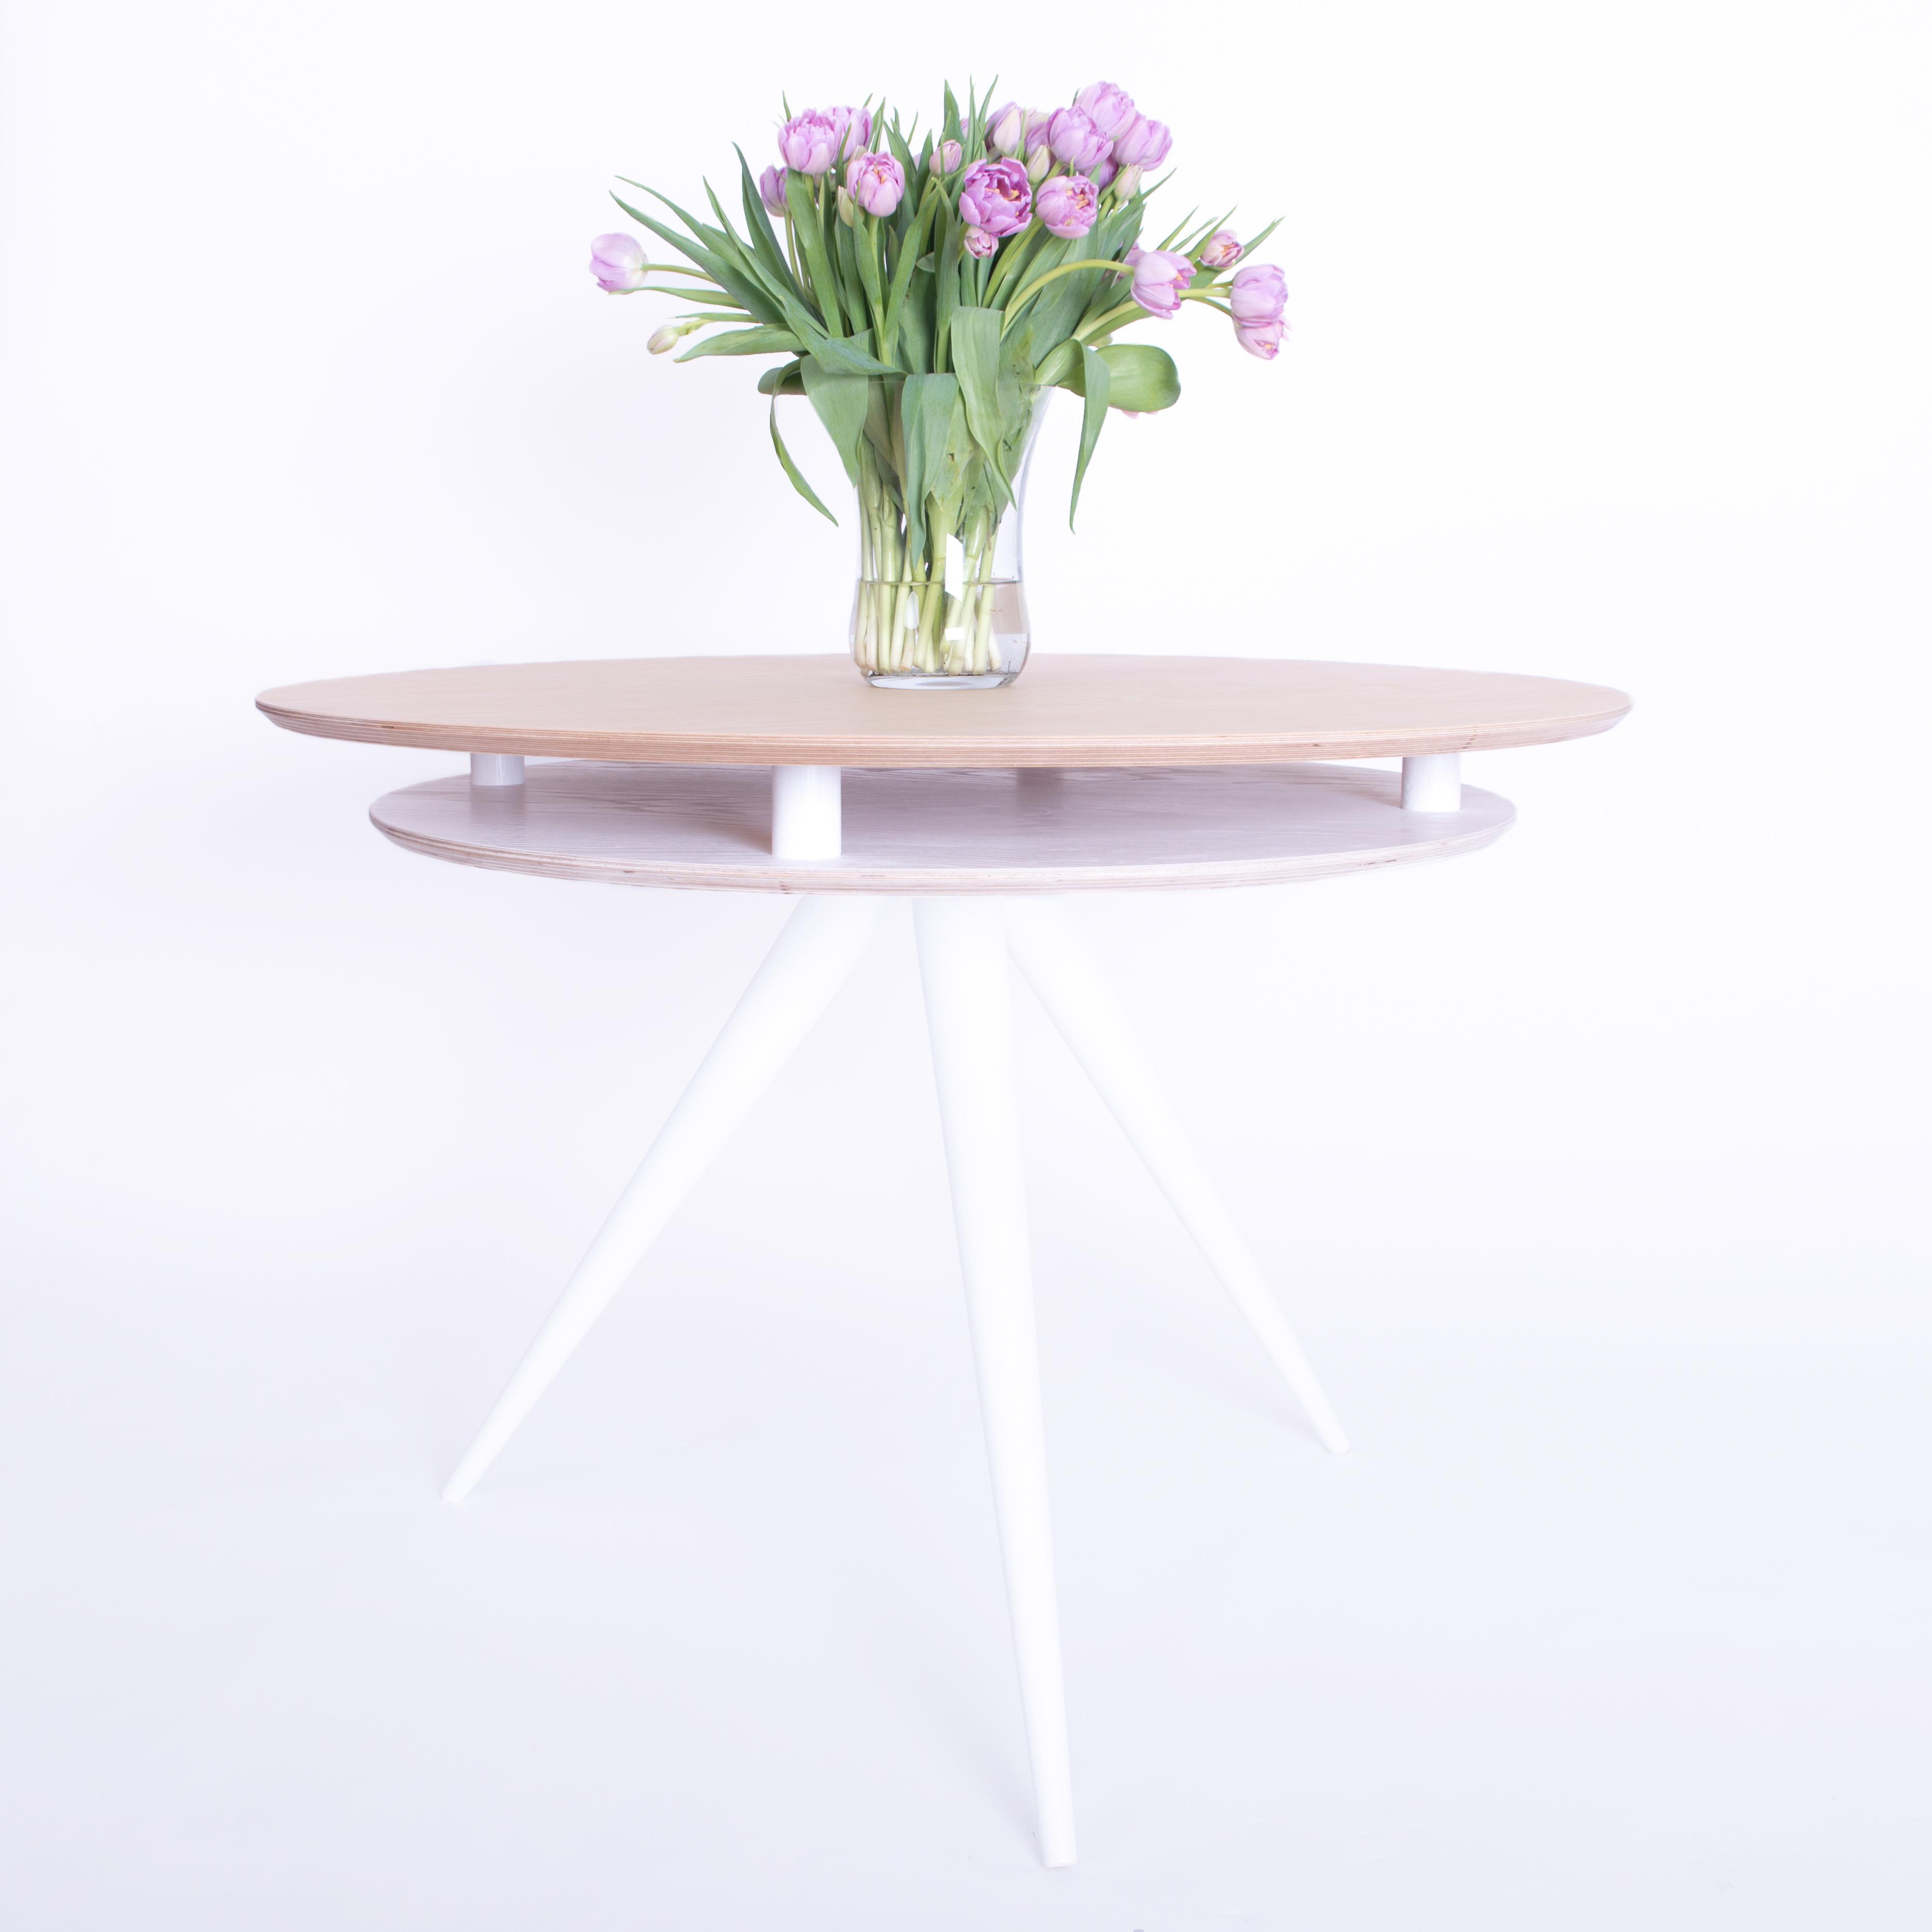 Masa Triad Nature/White, Ø105xh75 cm